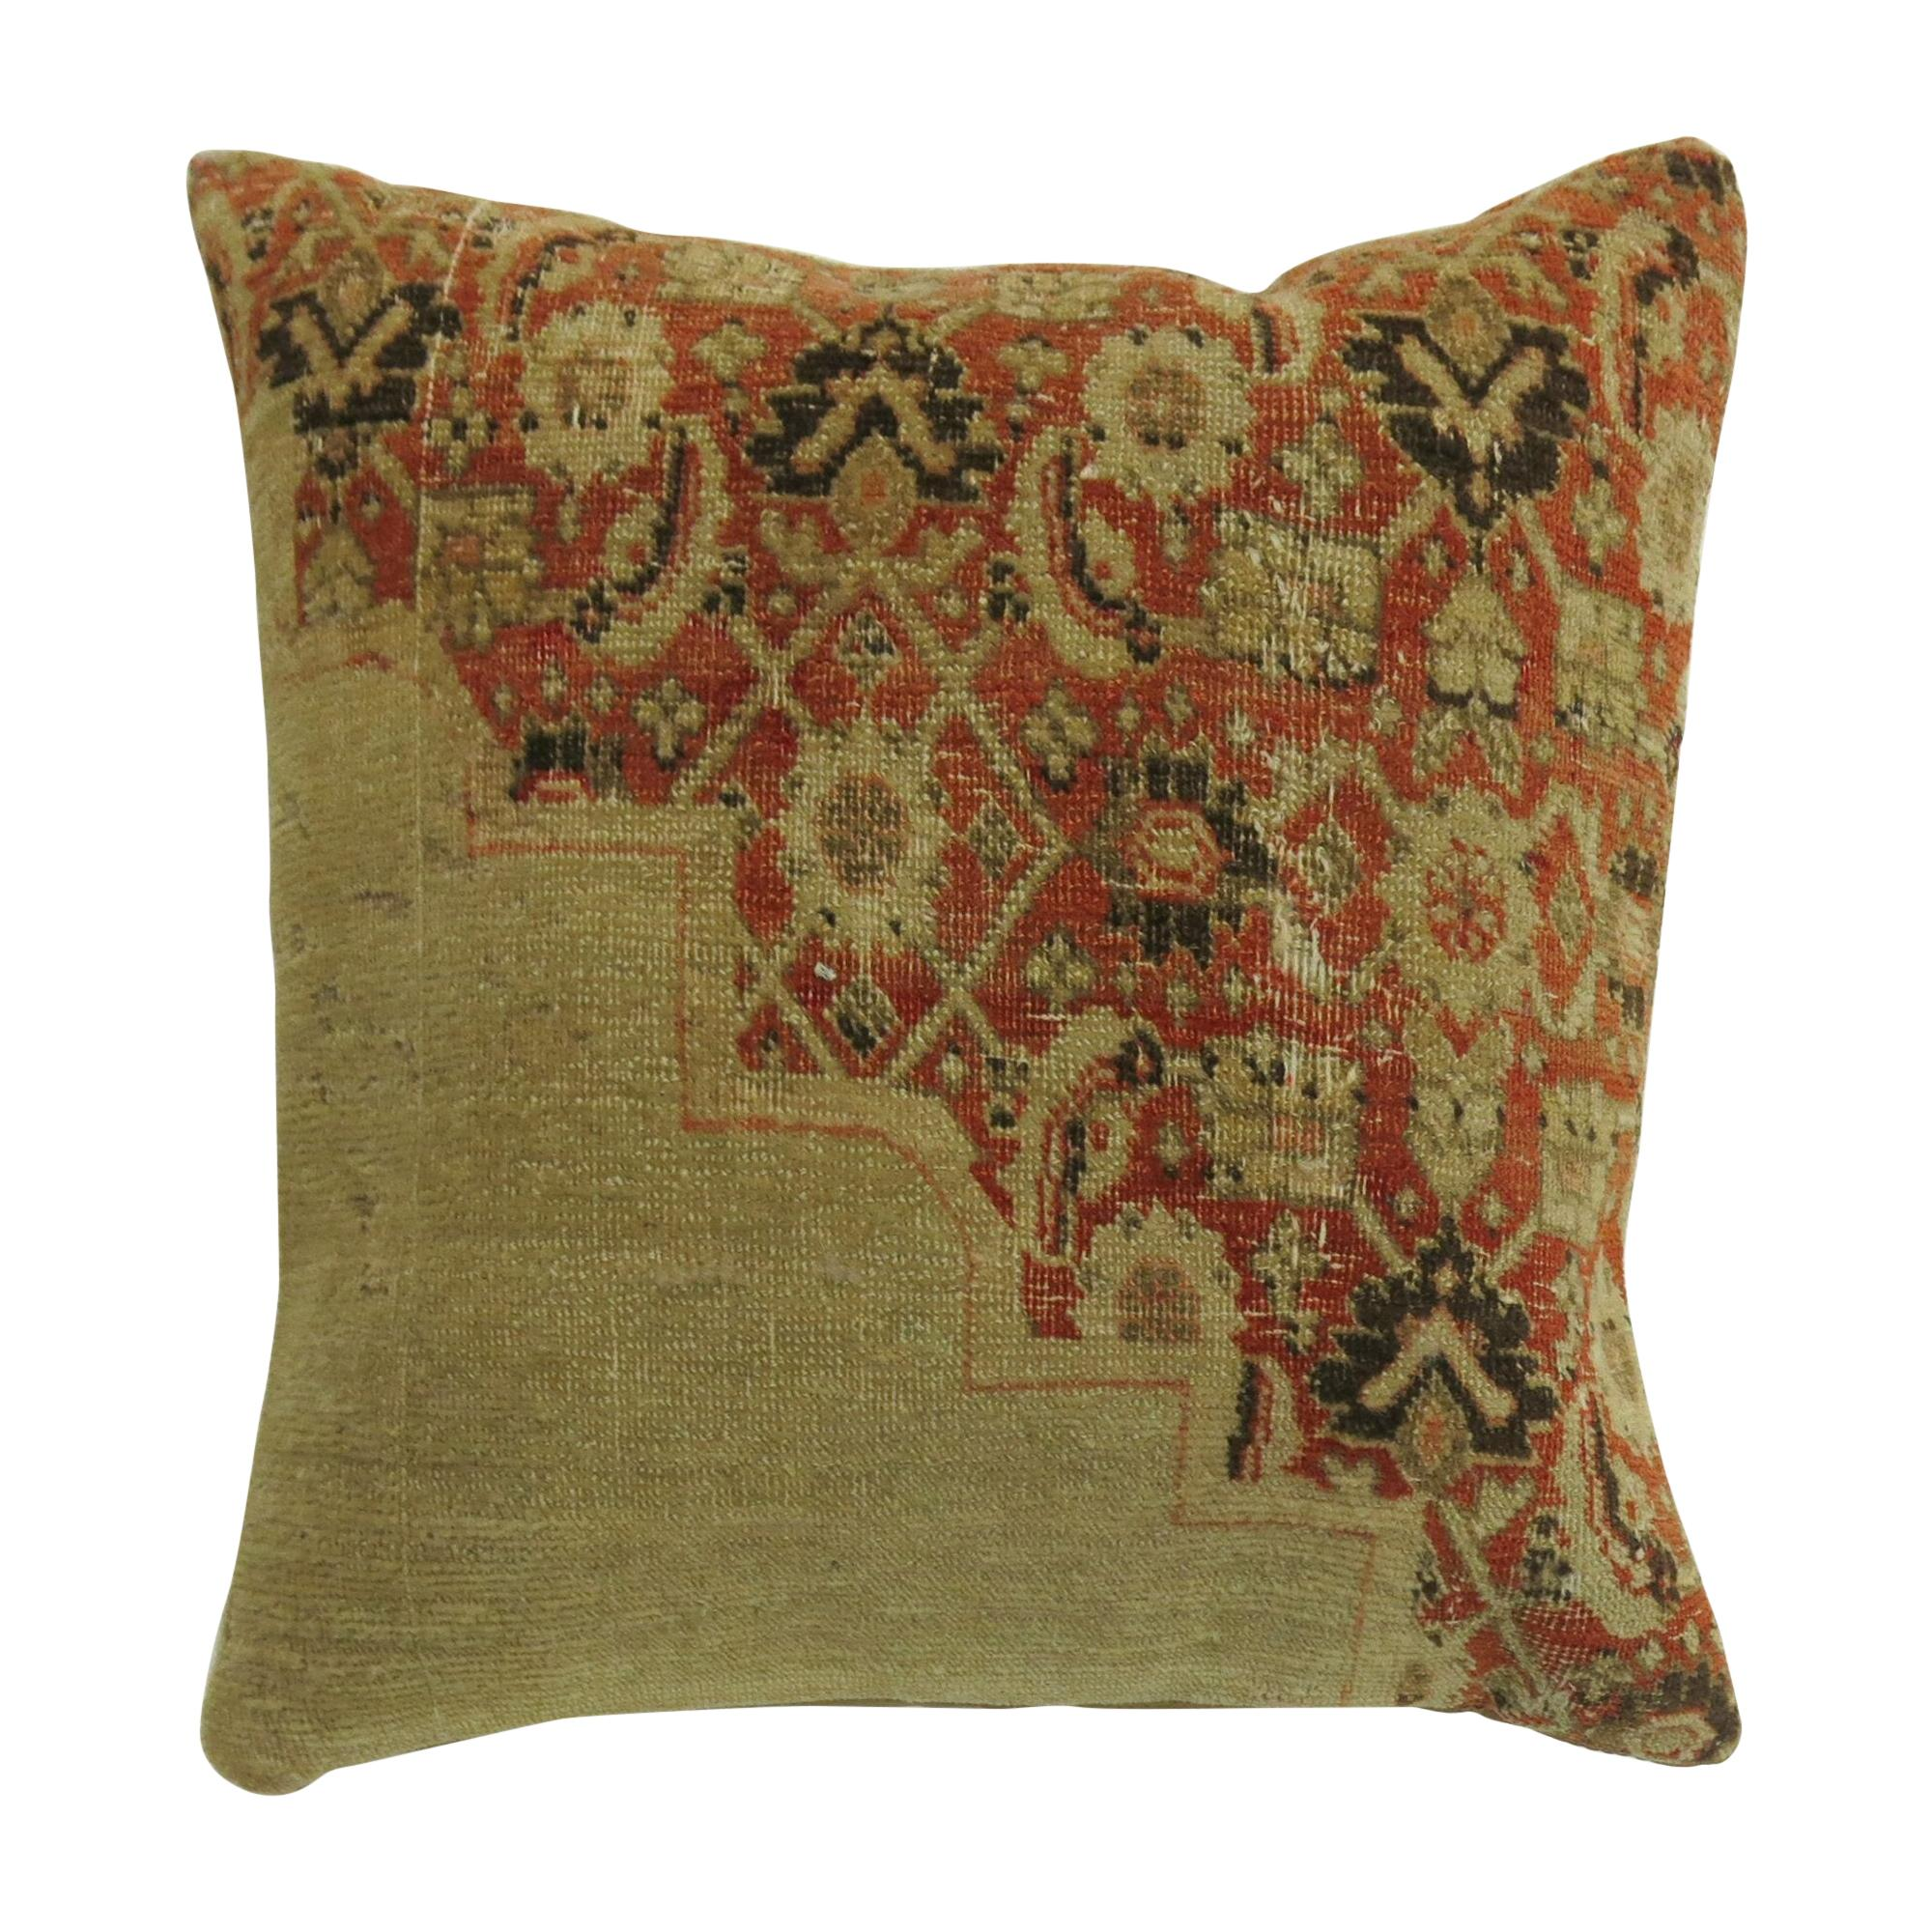 Orange and Beige Antique Tabriz Square Rug Pillow